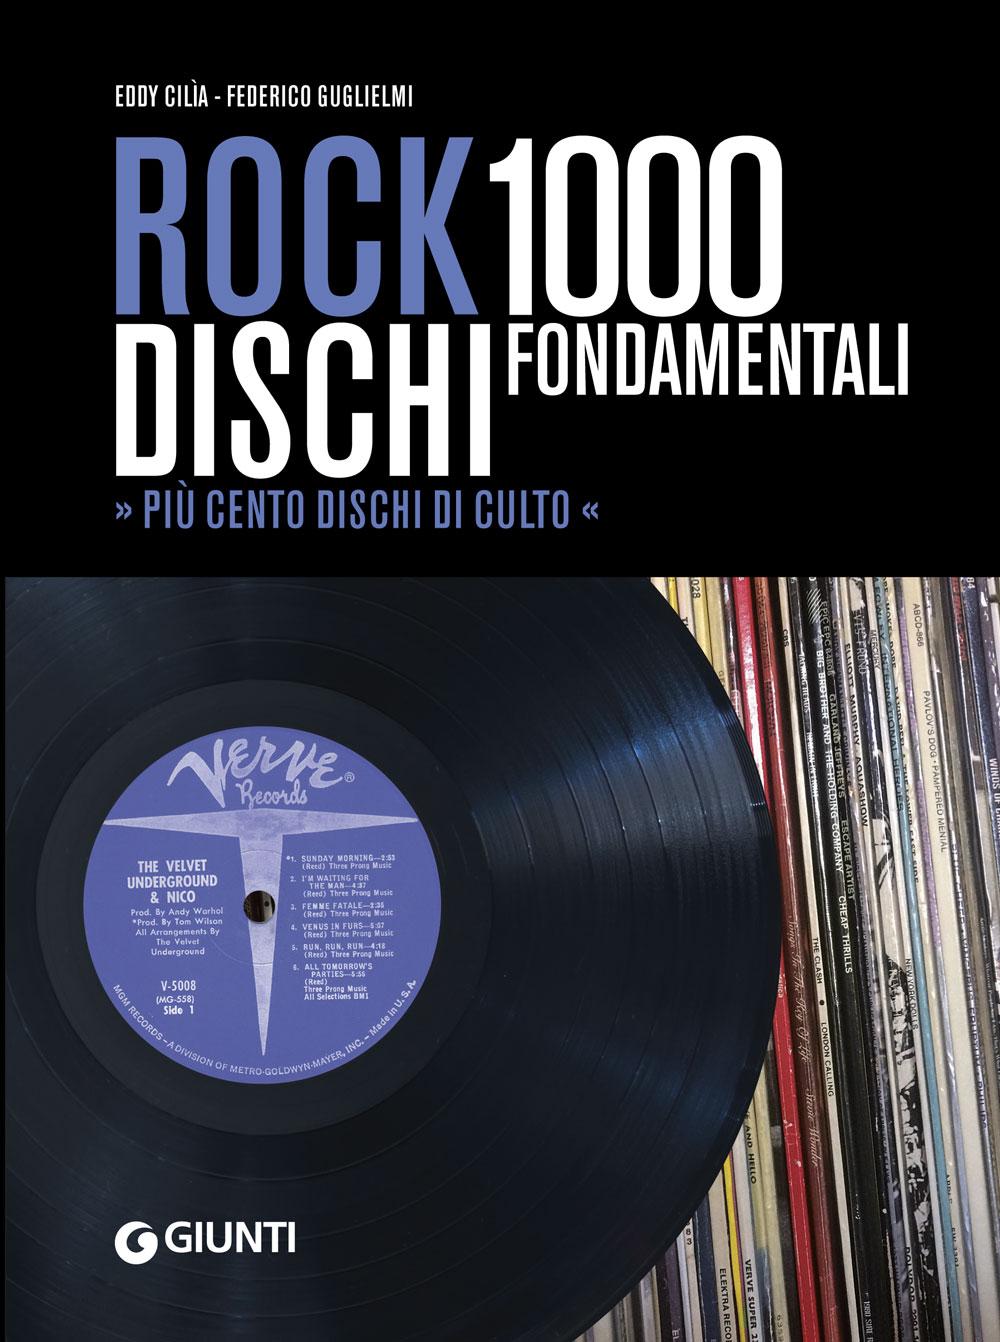 Rock: 1000 dischi fondamentali